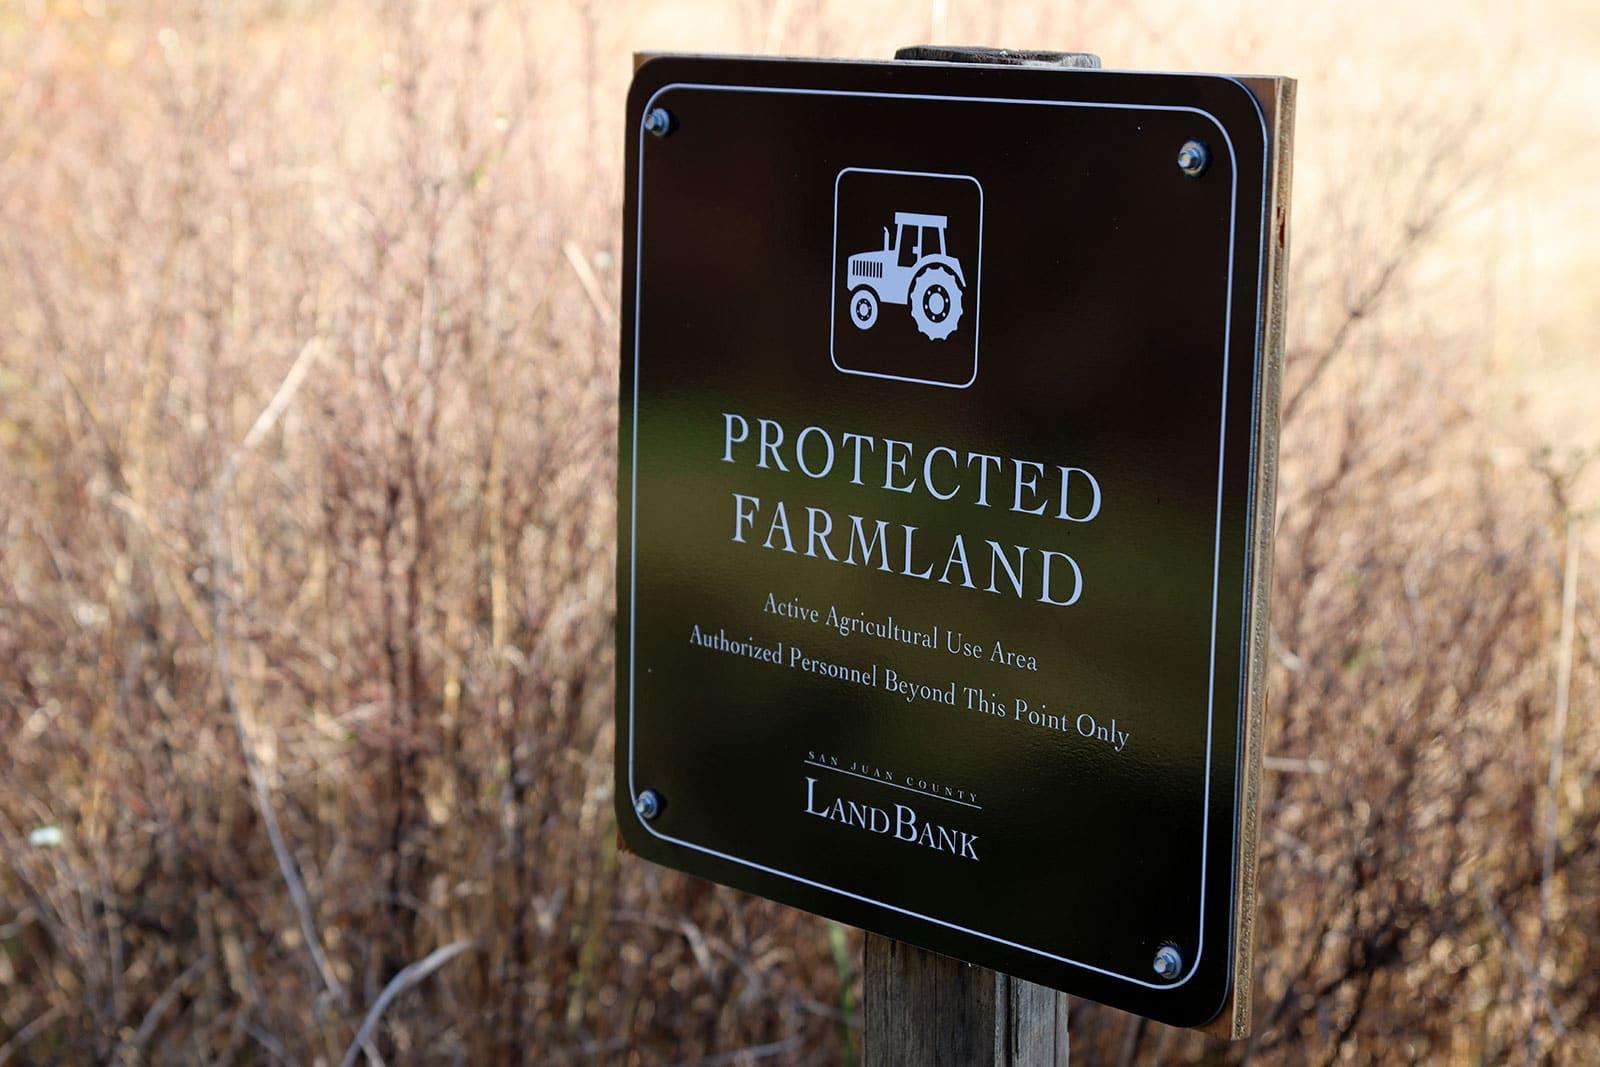 Zylstra Lake Preserve Protected Farmland